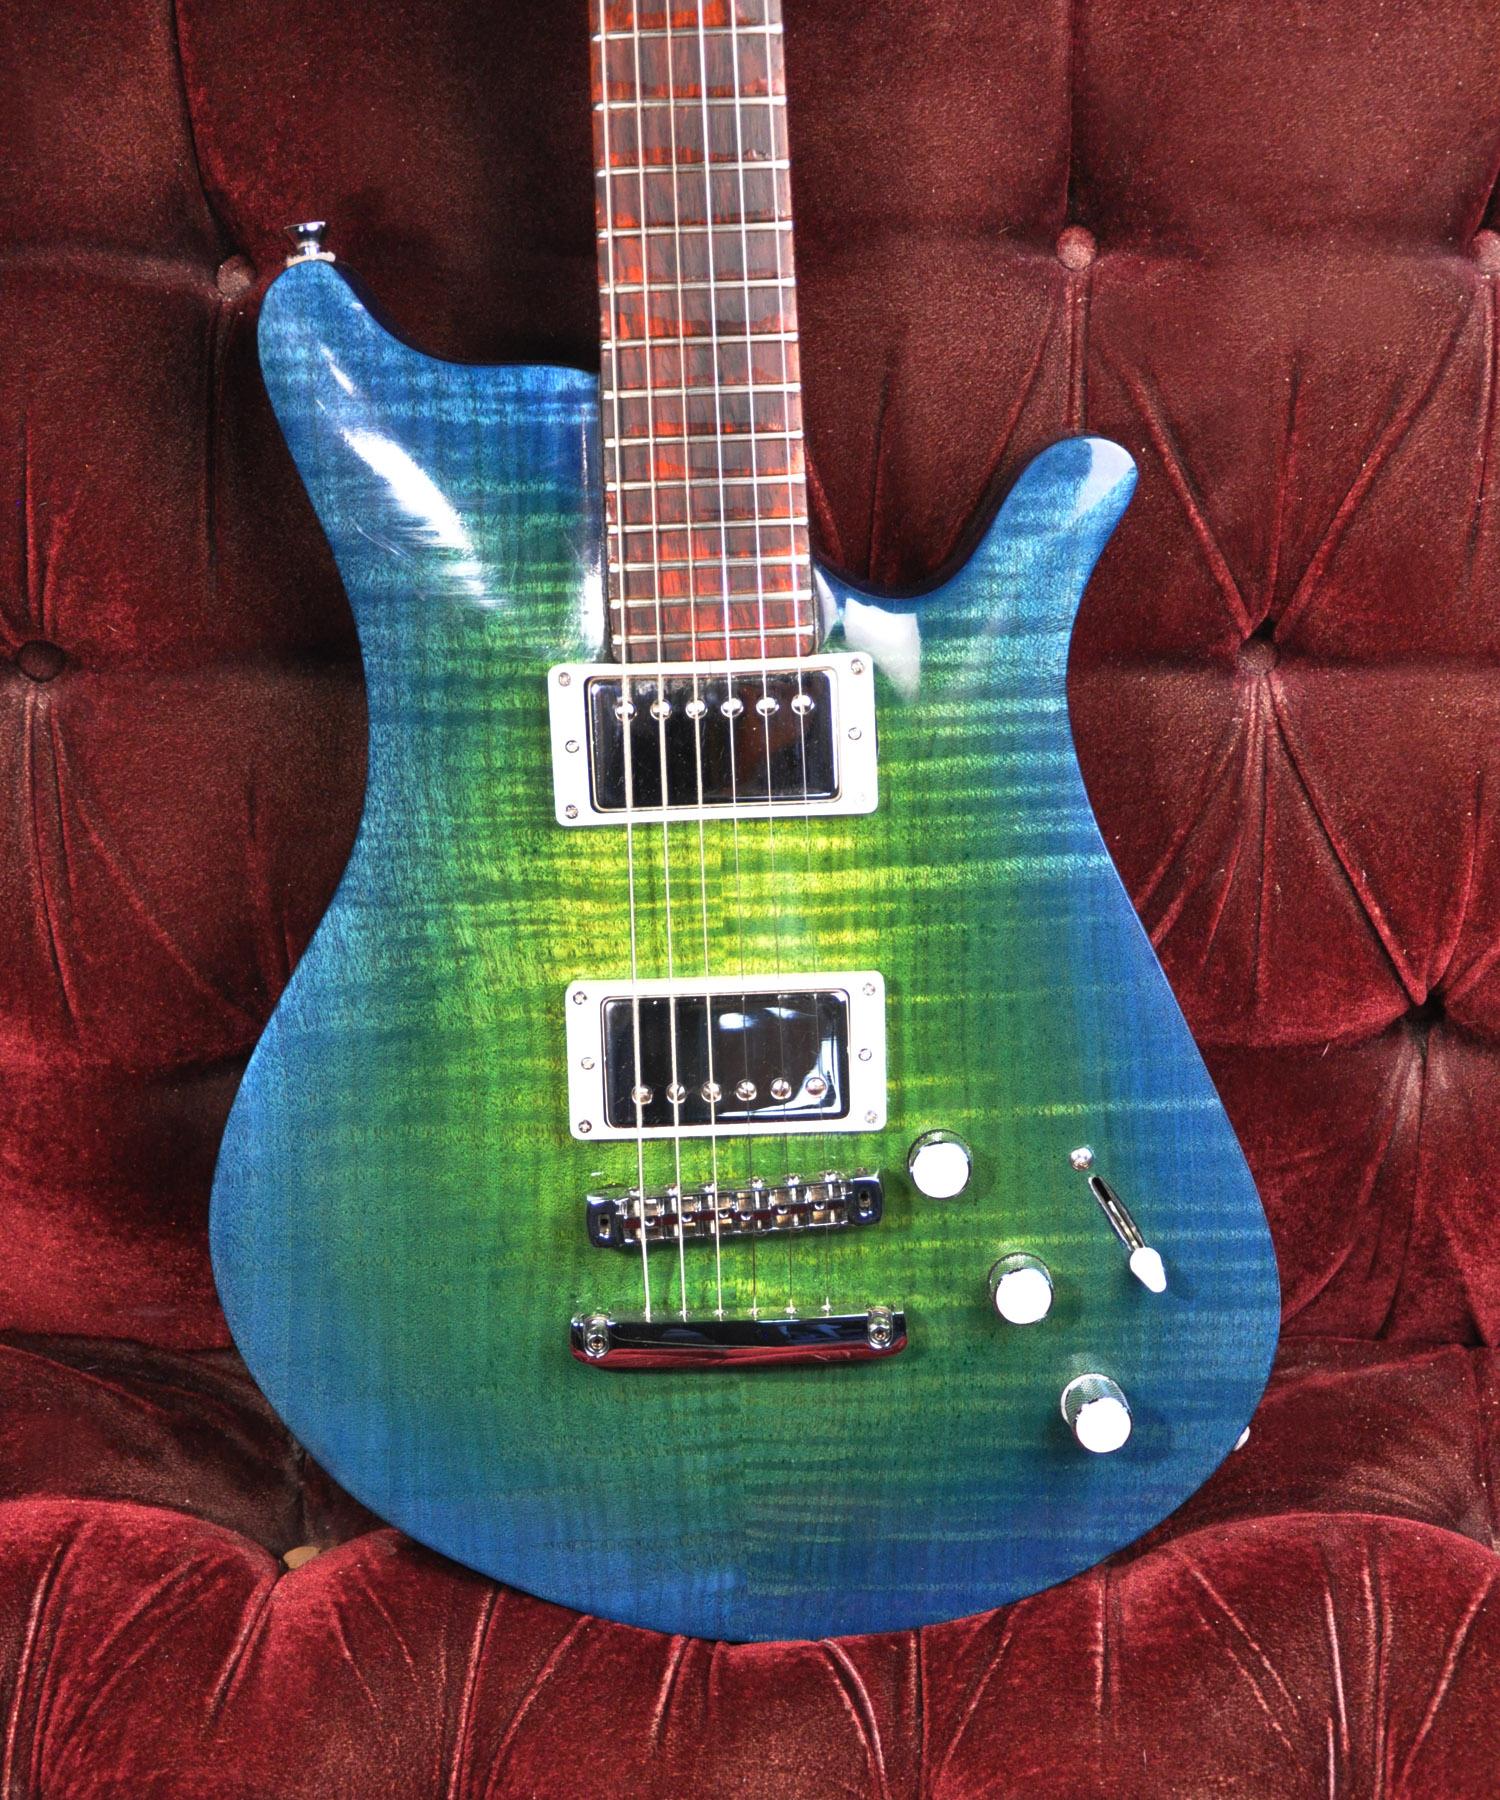 Prana Electric Guitar